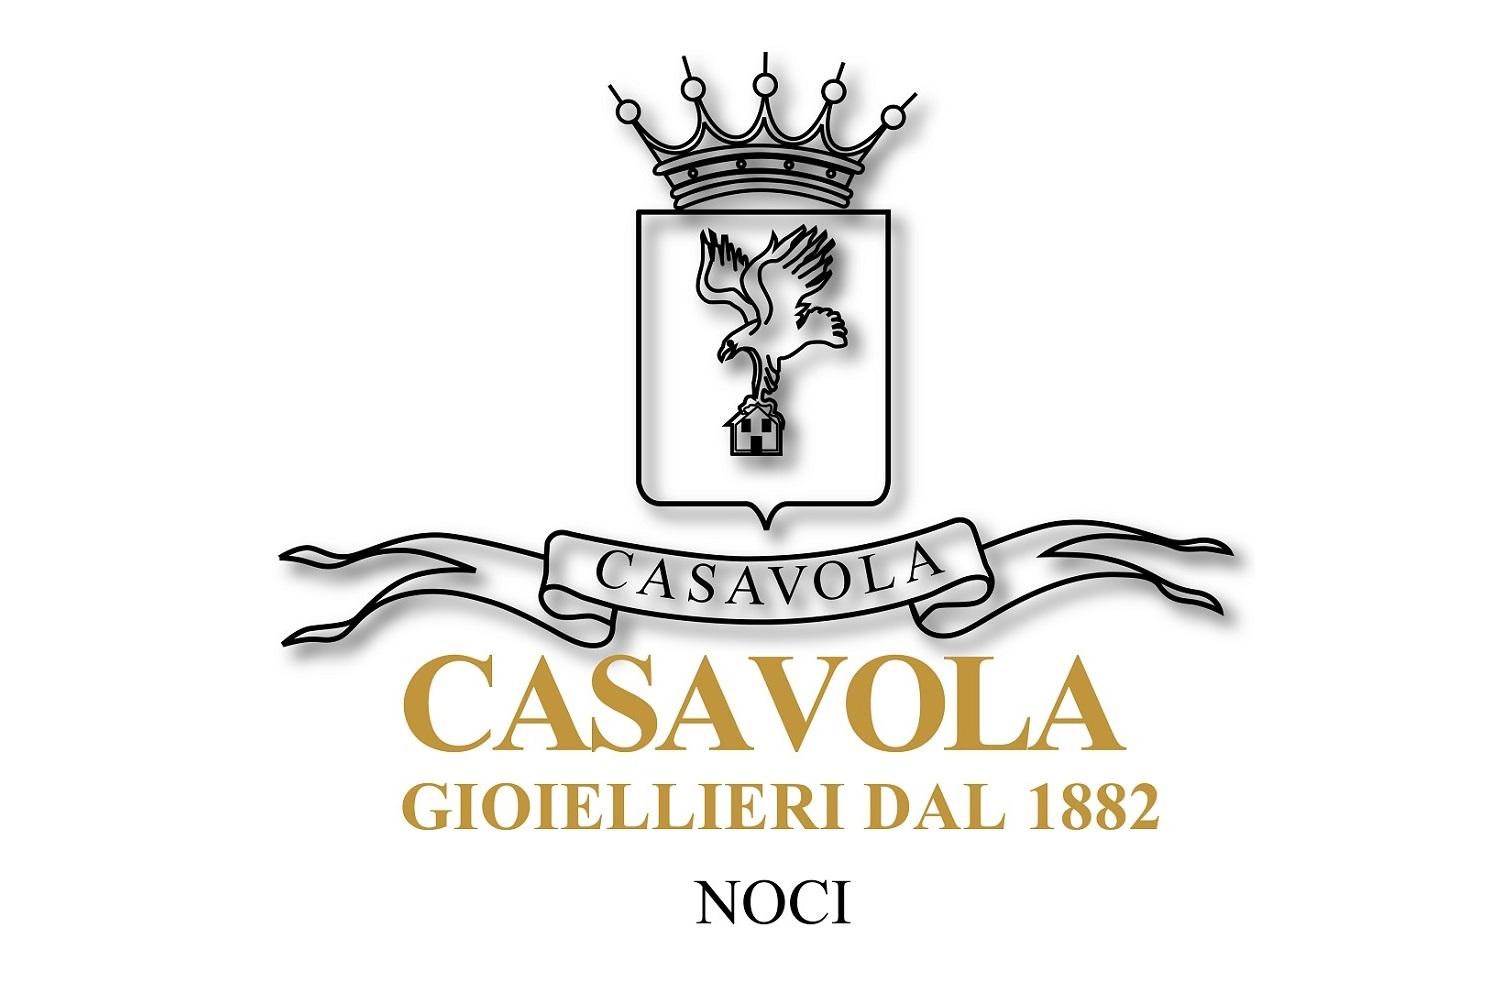 Baselworld 2018 - Gioielleria Casavola Noci